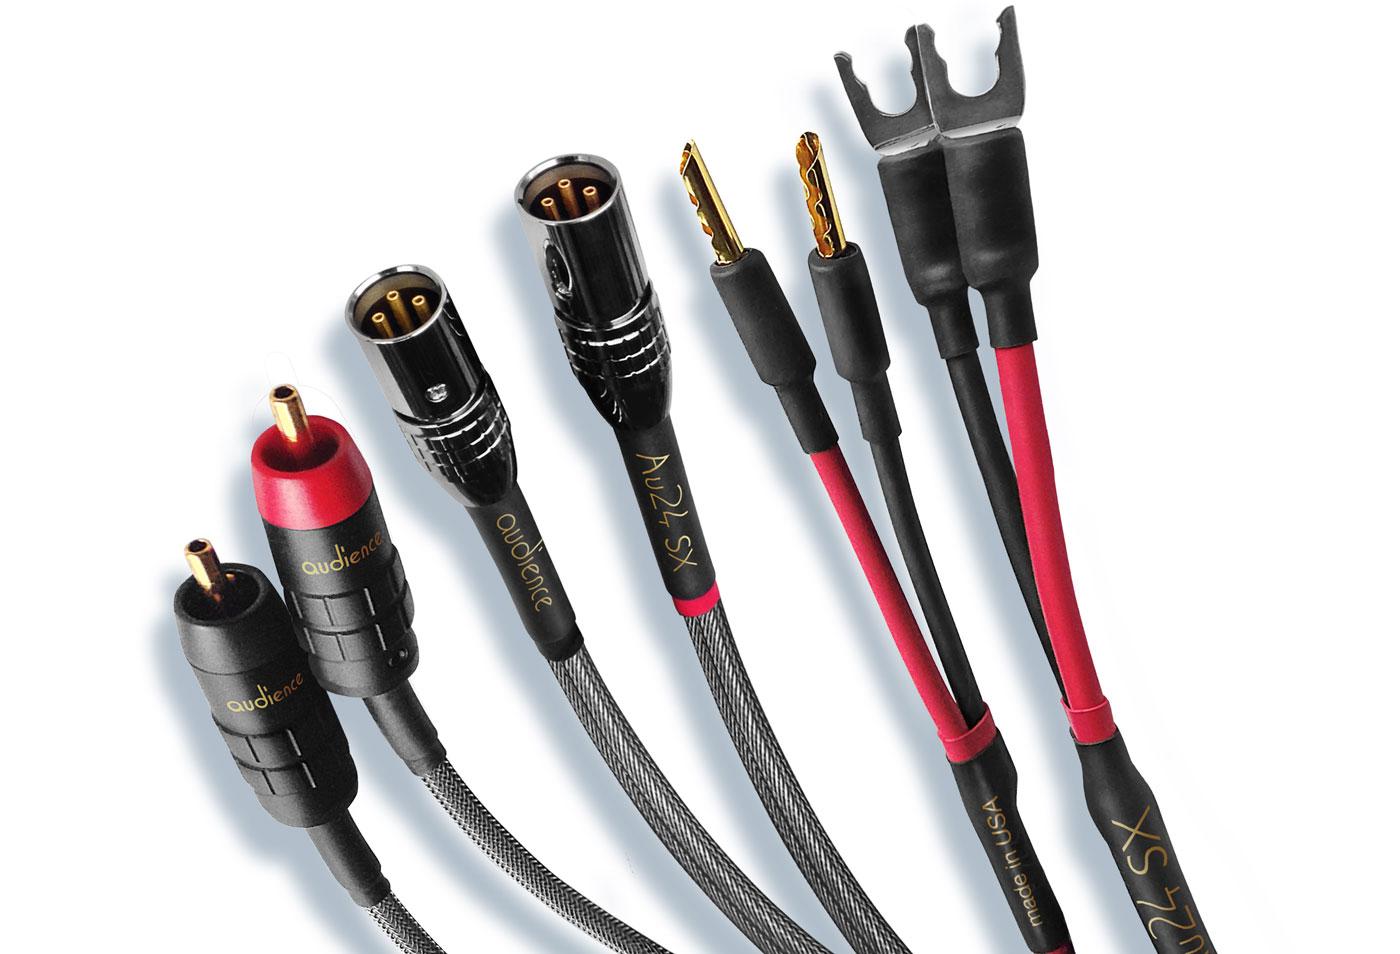 Audience Au24 SX Cable System Review | The Audio Beatnik